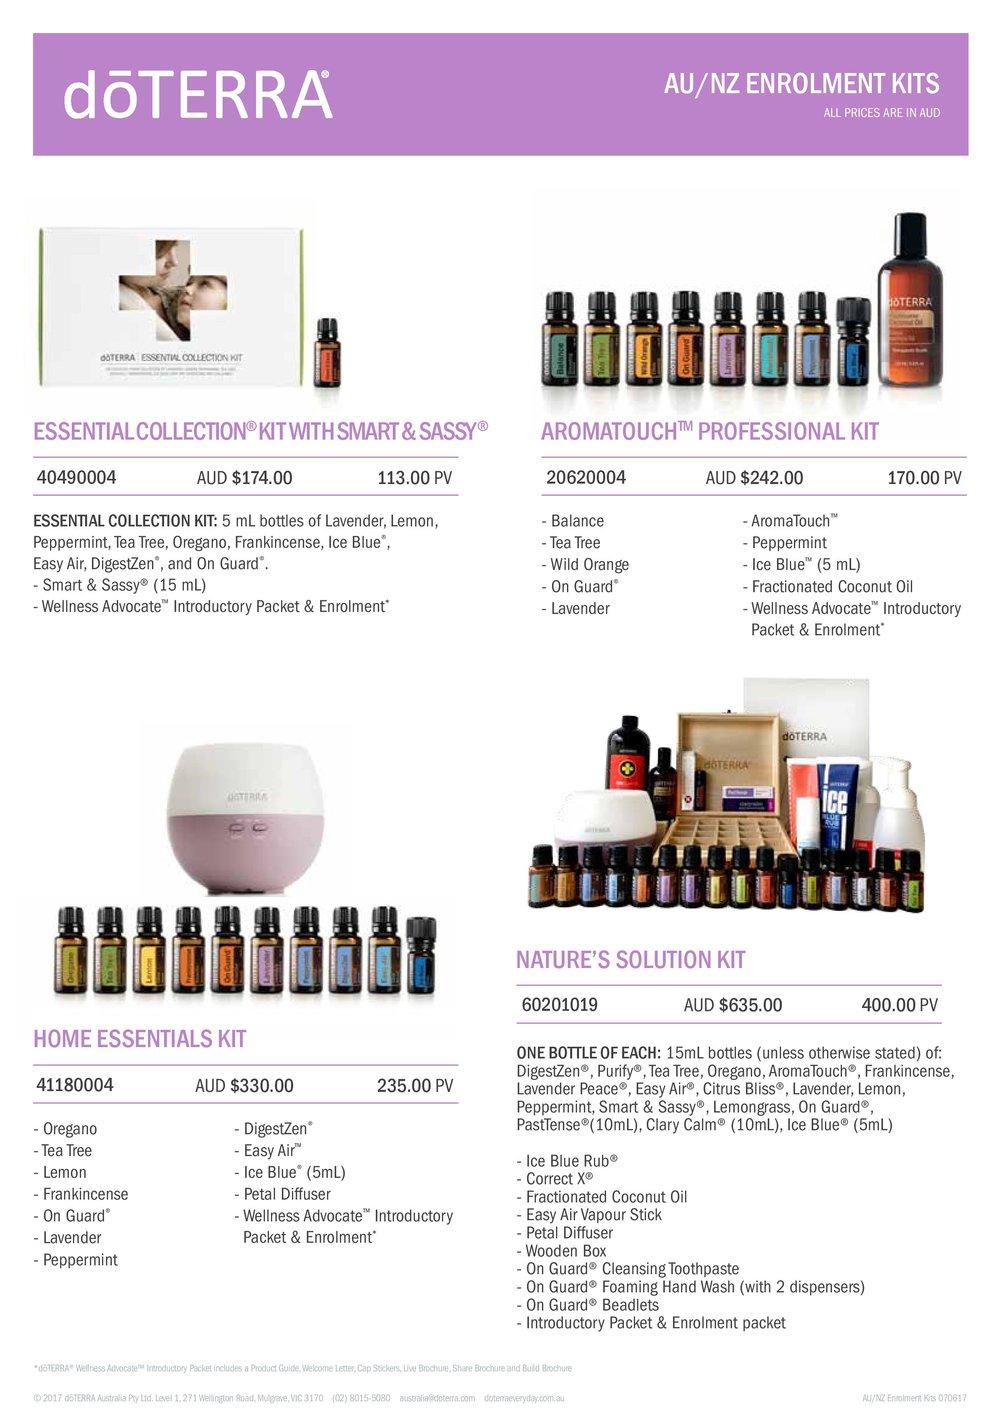 dT Enrolment Kits-page-001.jpg